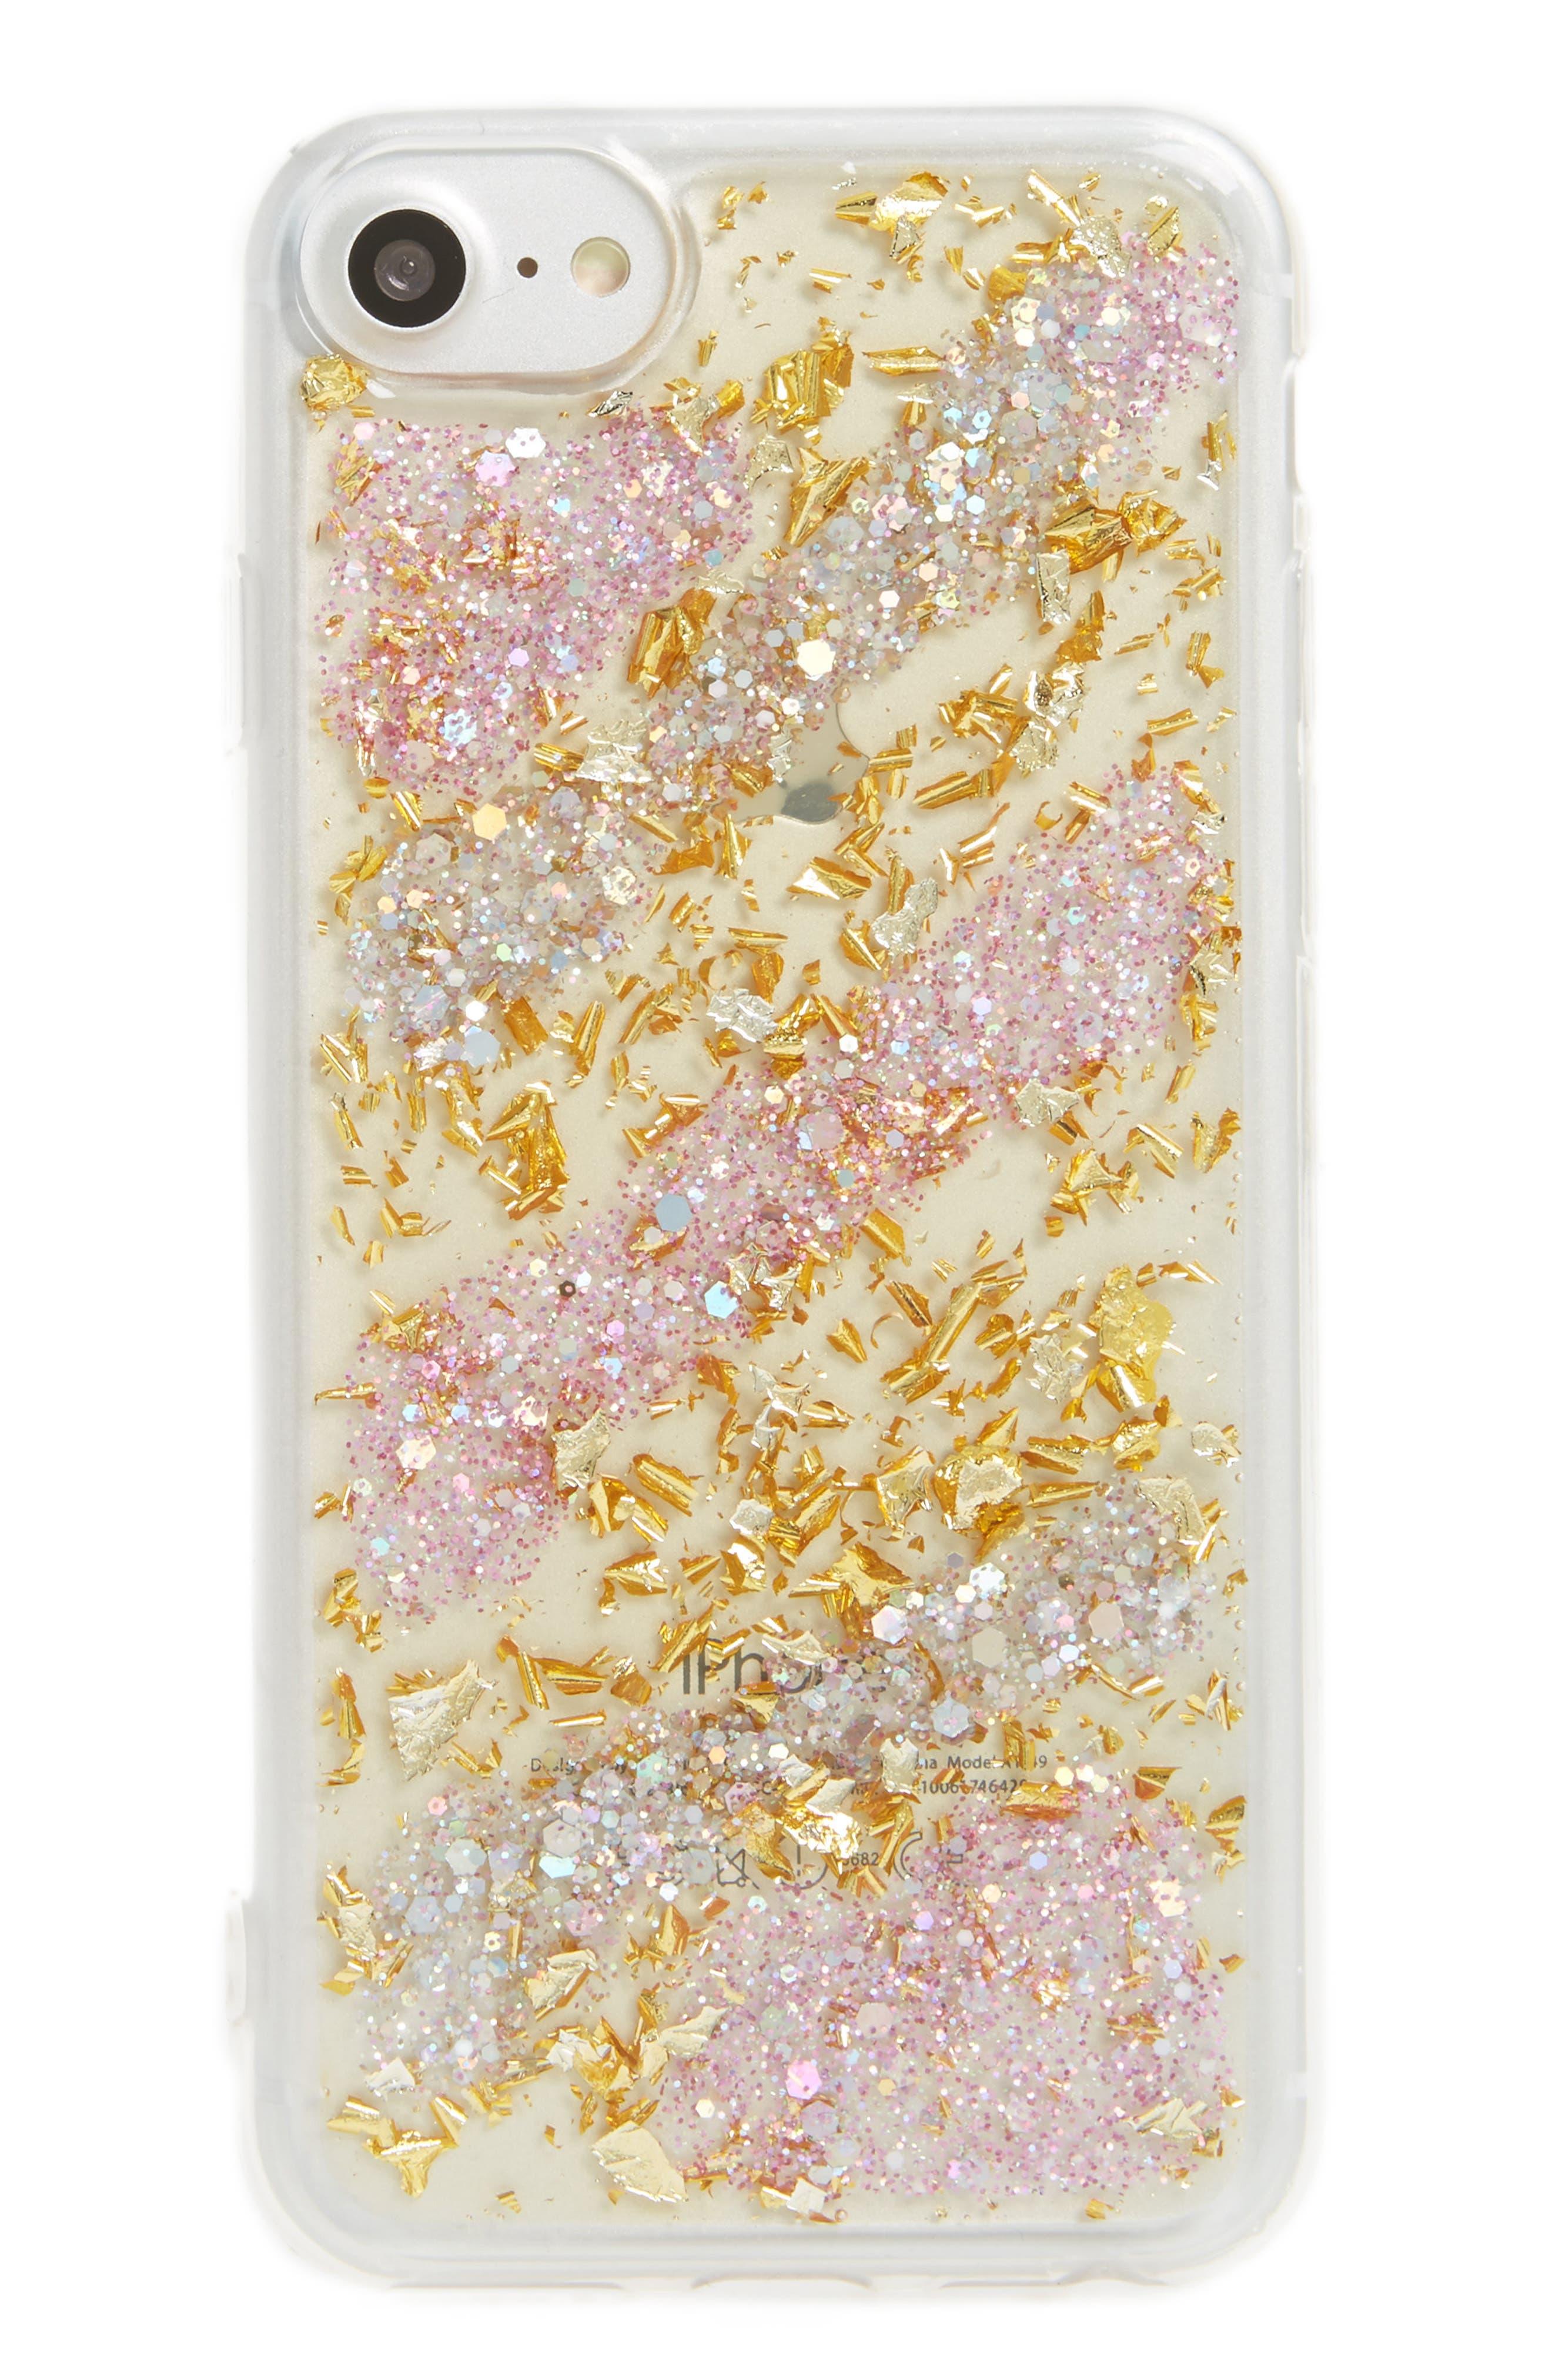 Main Image - OK originals Glitter Stripe iPhone 6/6s/7 Case